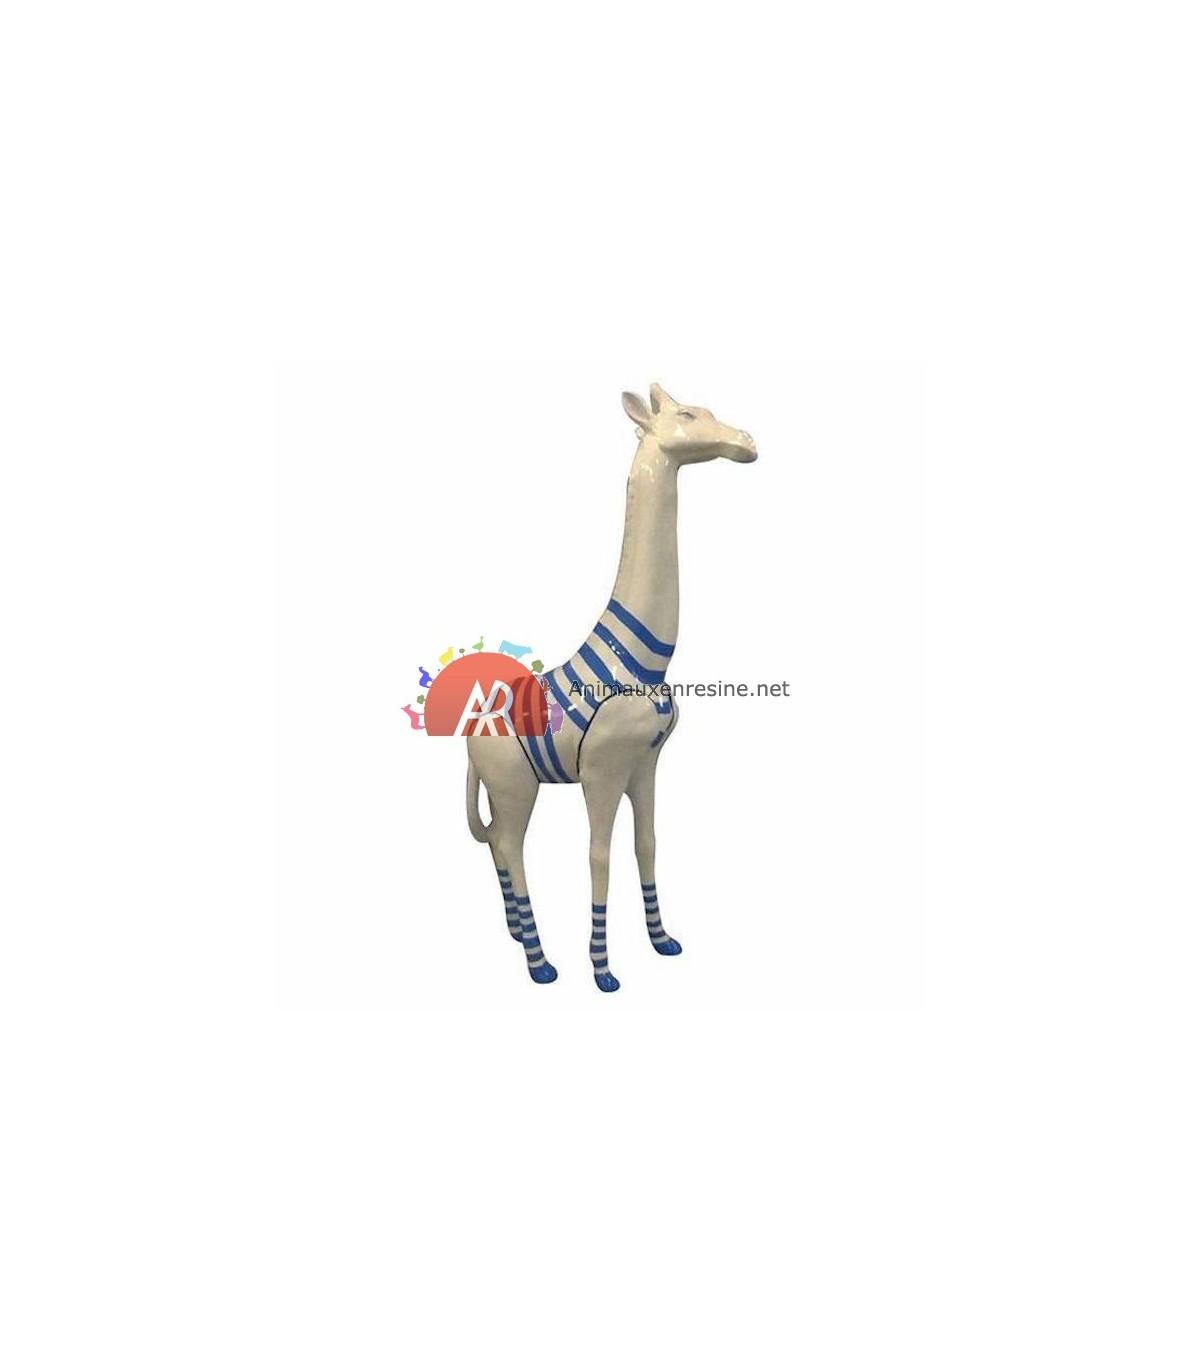 Girafe Resine Moyen Modèle Marinière 205Cm destiné Nain De Jardin Fuck